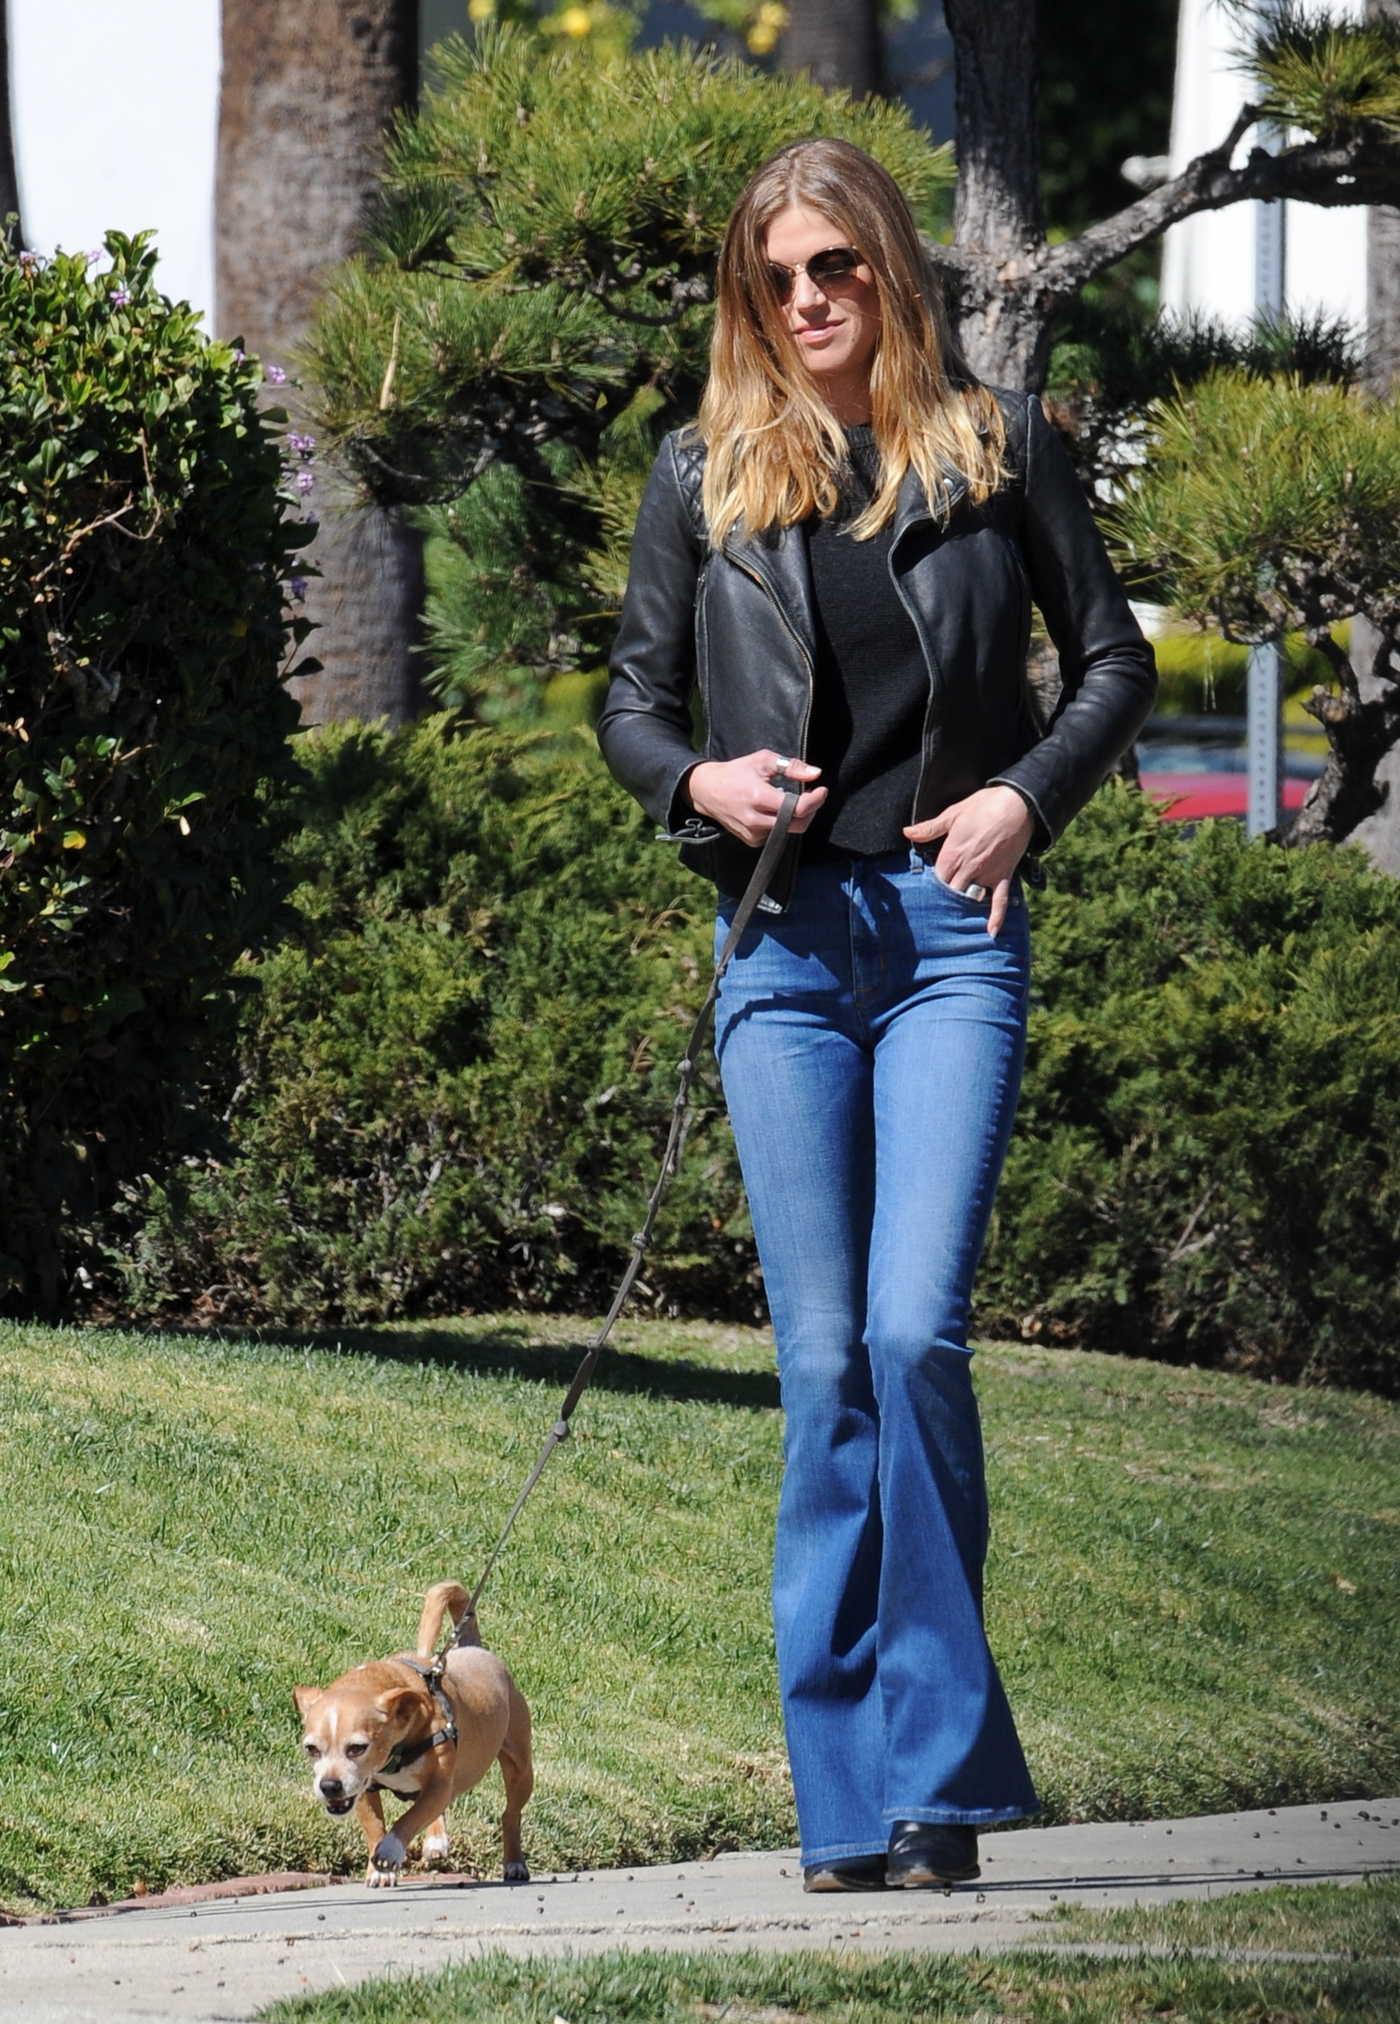 Adrianne Palicki Walks Her Dog Olly Out in LA 02/23/2018